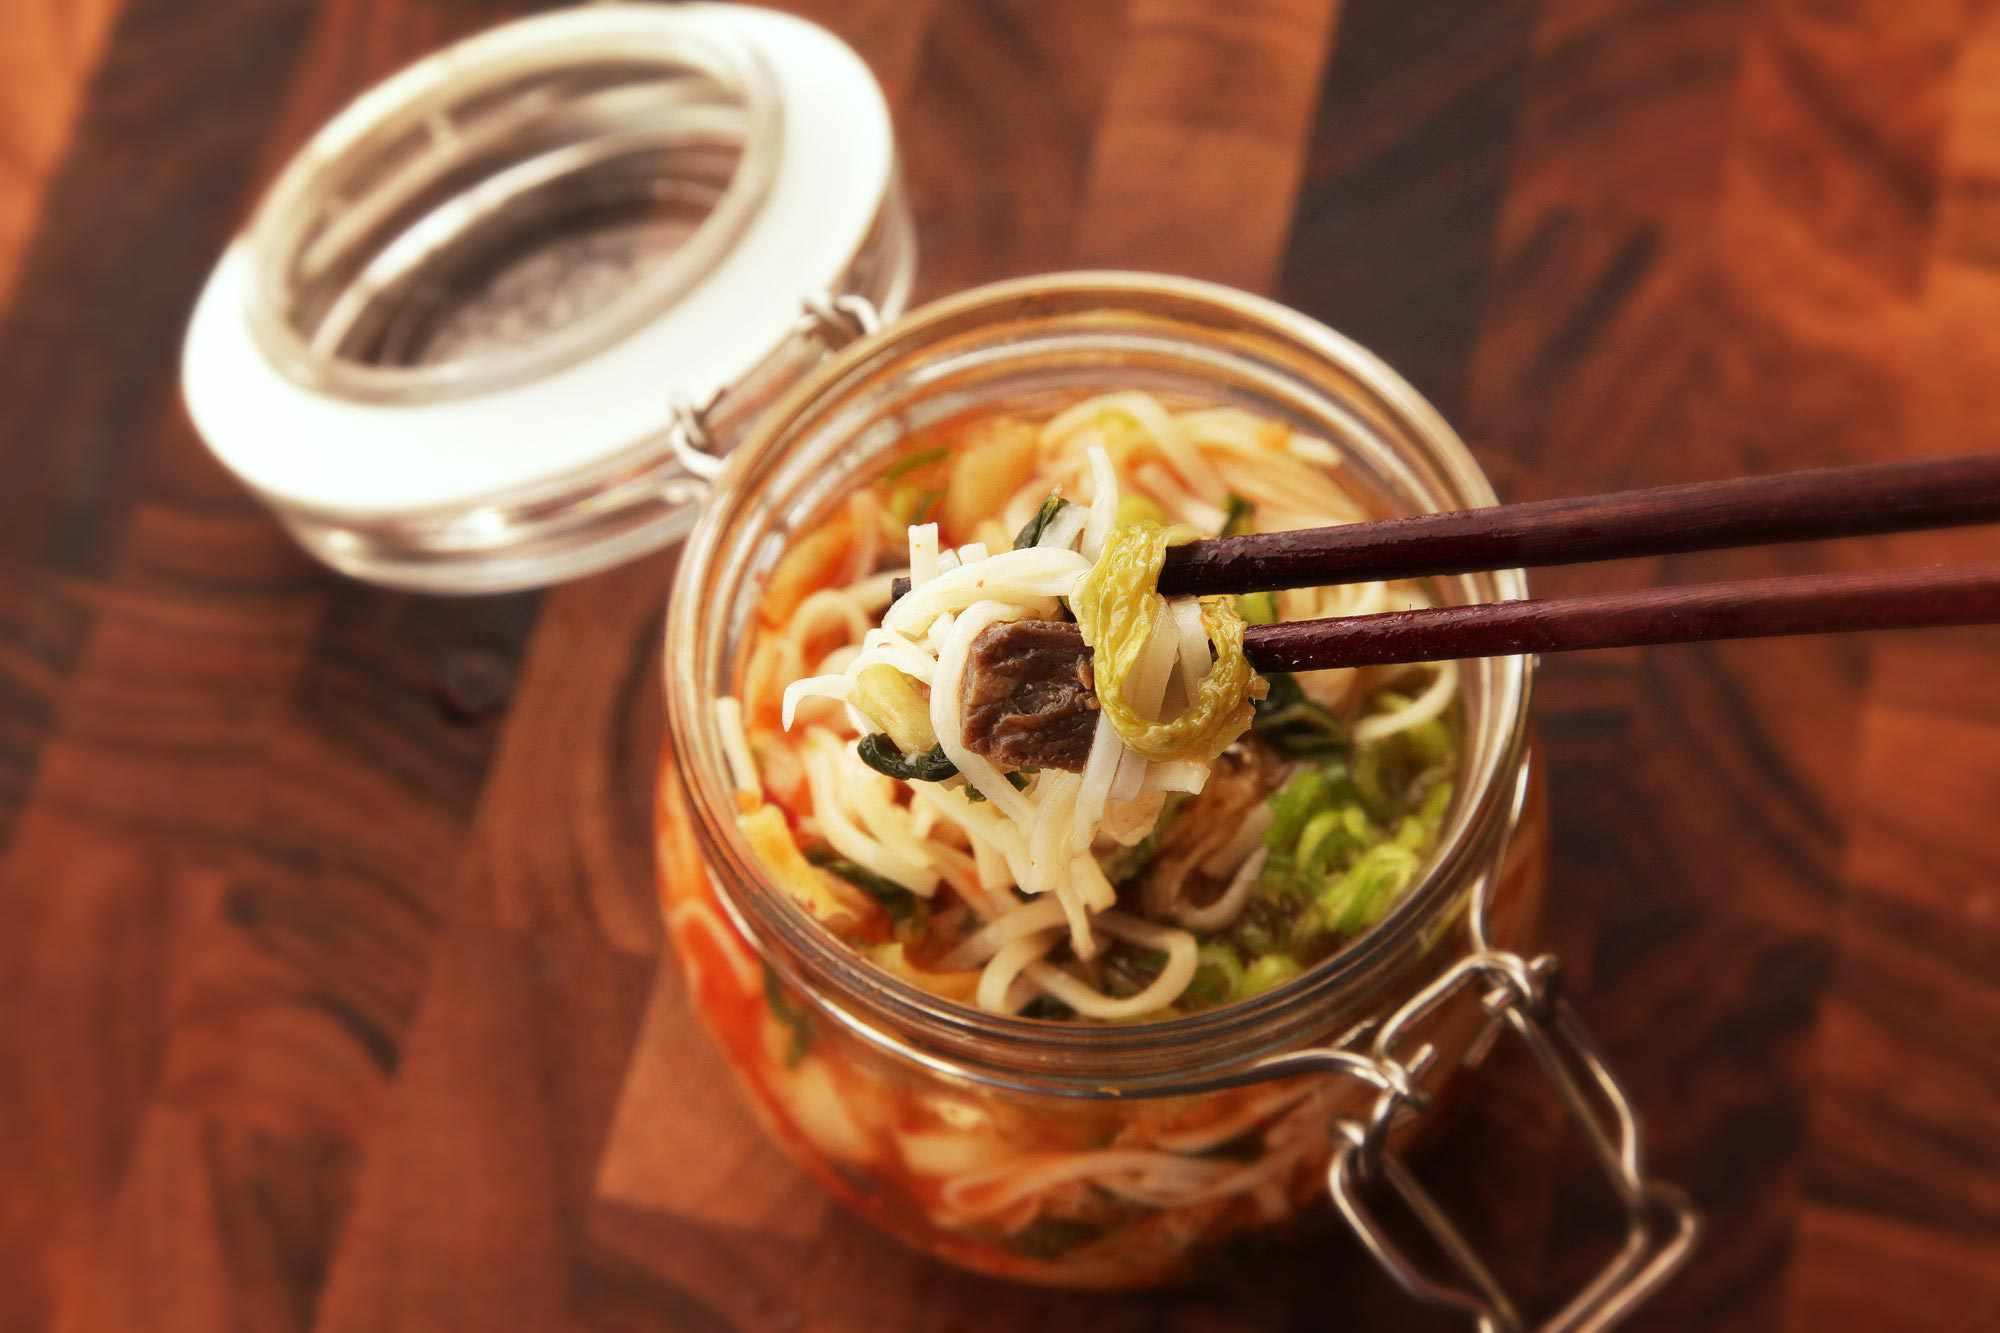 20140929-instant-noodles-diy-recipe-kimchi-beef-17.jpg